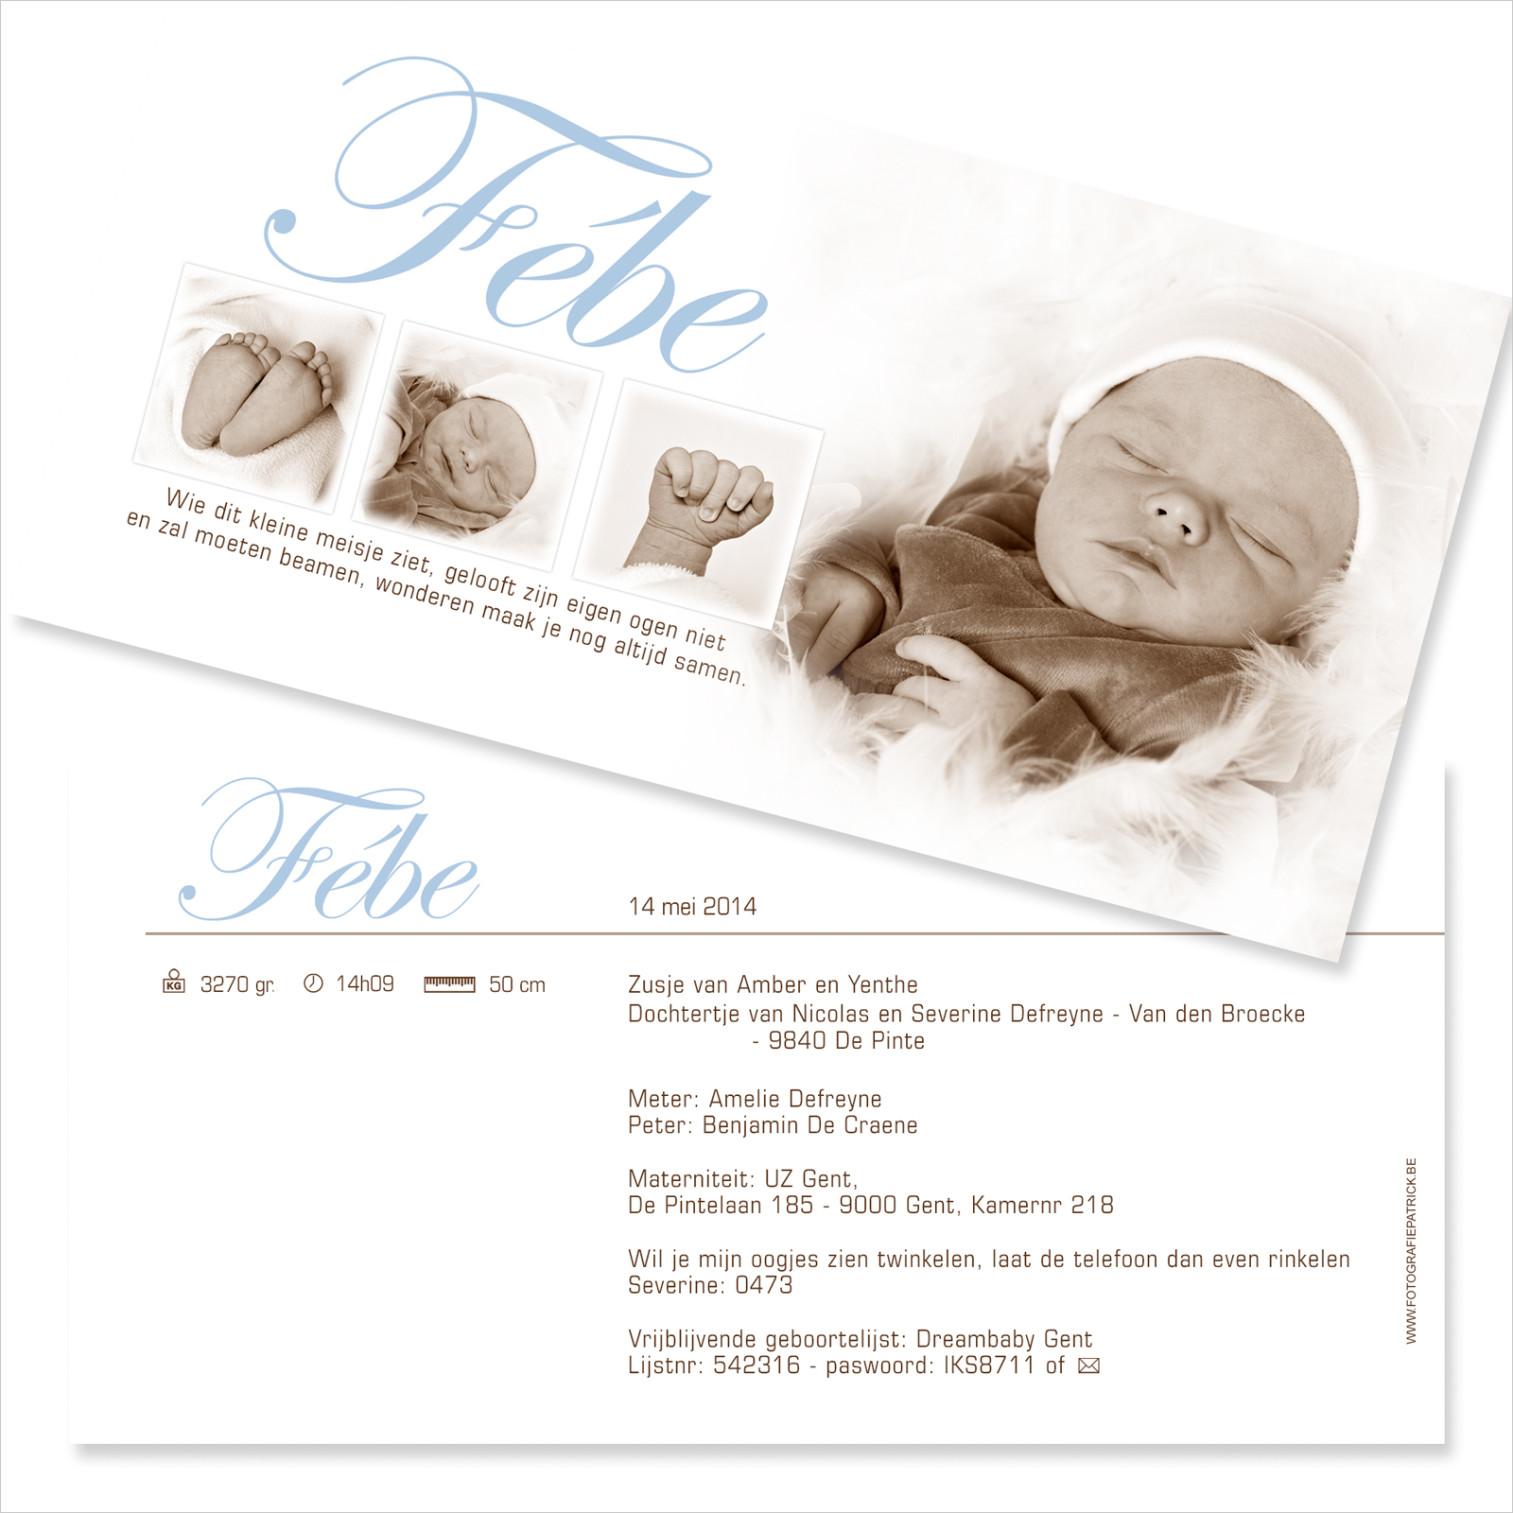 Geboortekaartje met foto van Febe